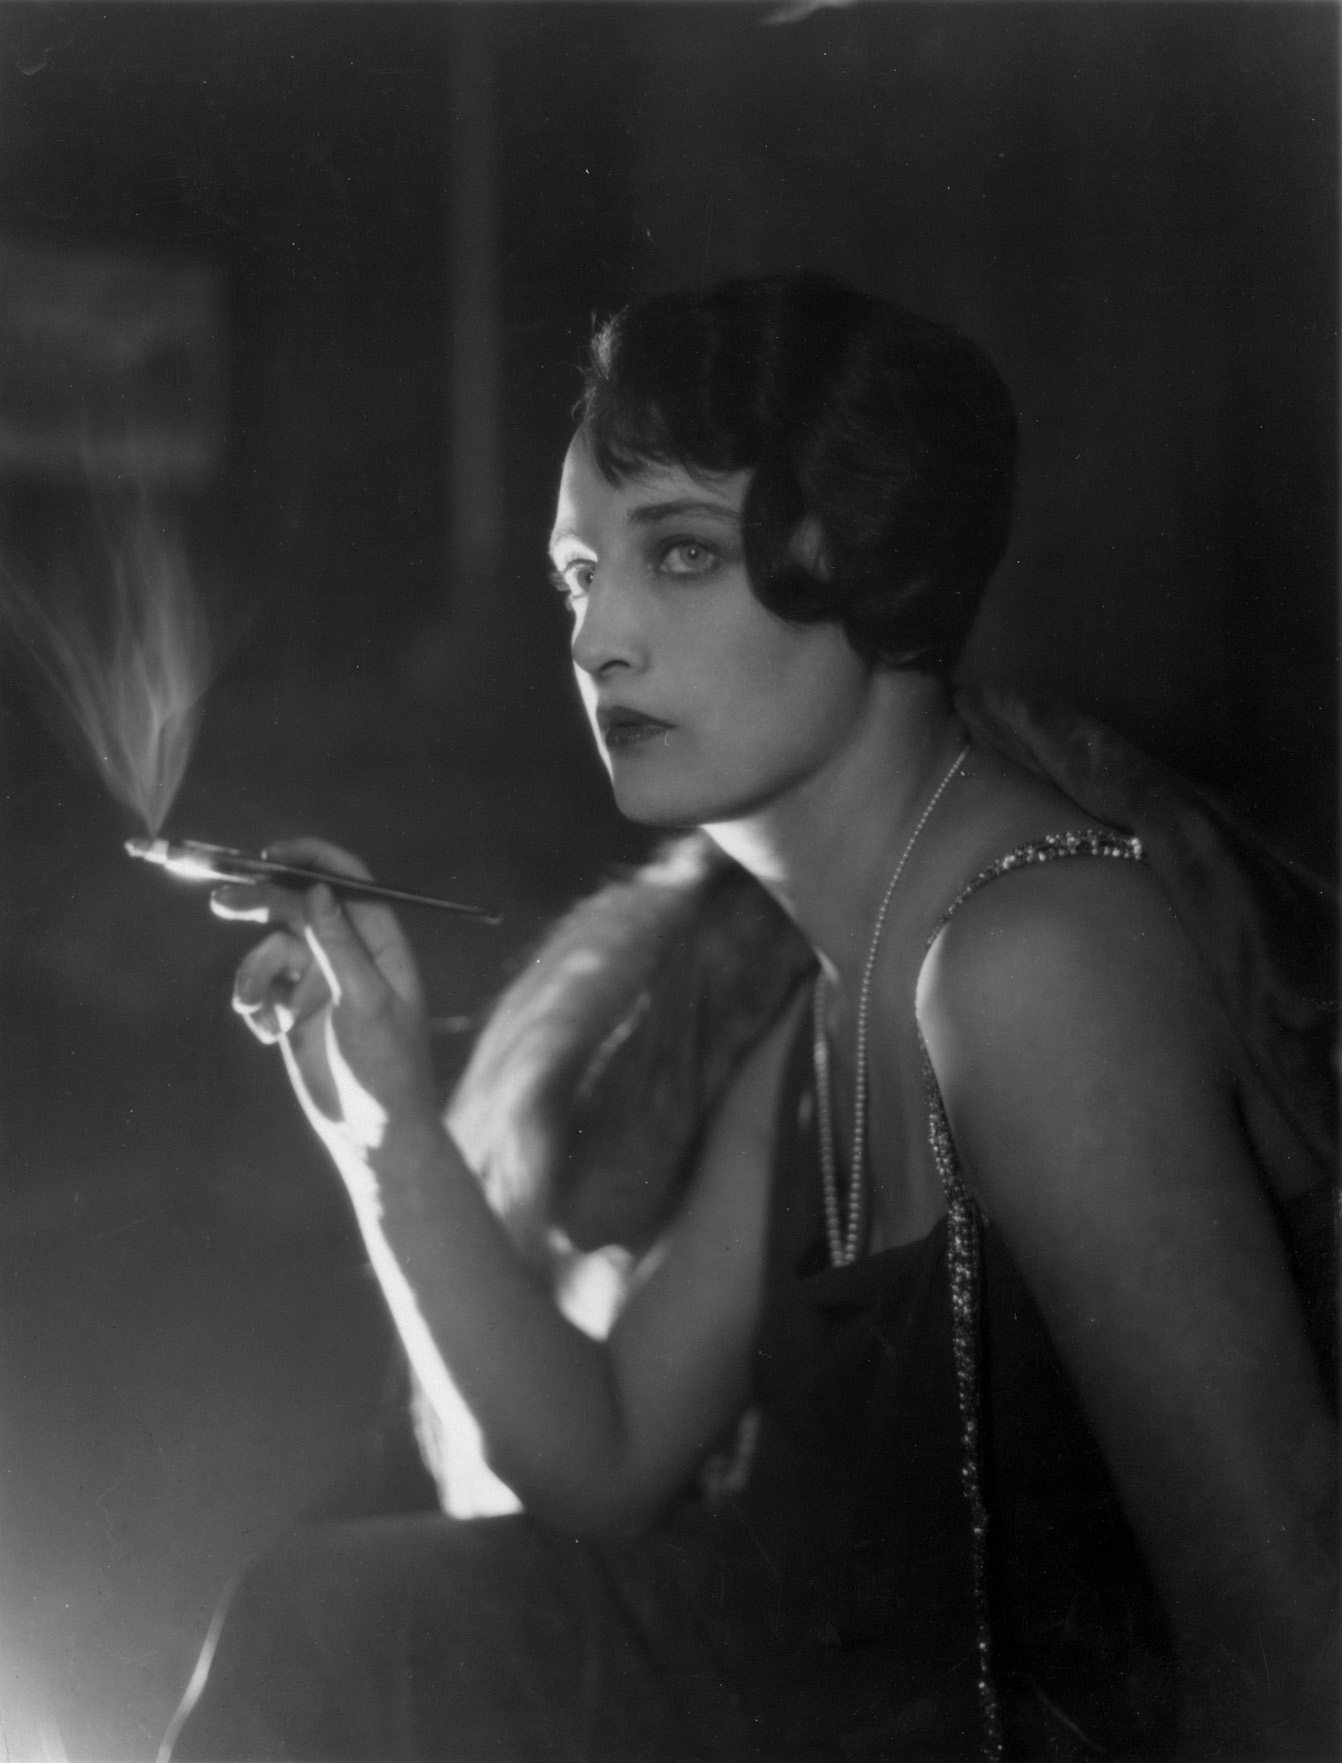 Smoking Glamour fine art photography